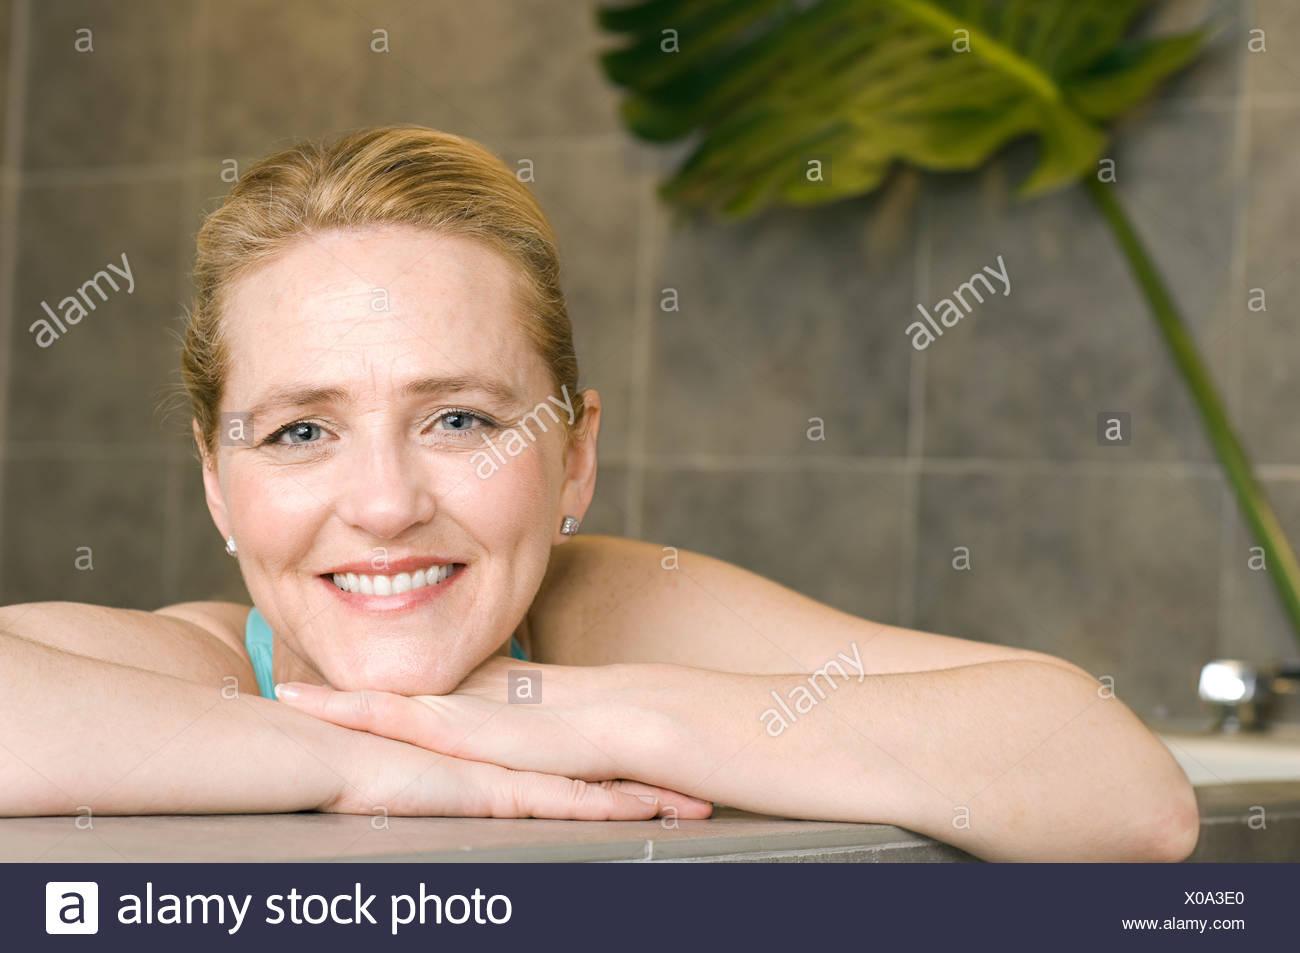 Hot Bath Tub Stock Photos Amp Hot Bath Tub Stock Images Alamy